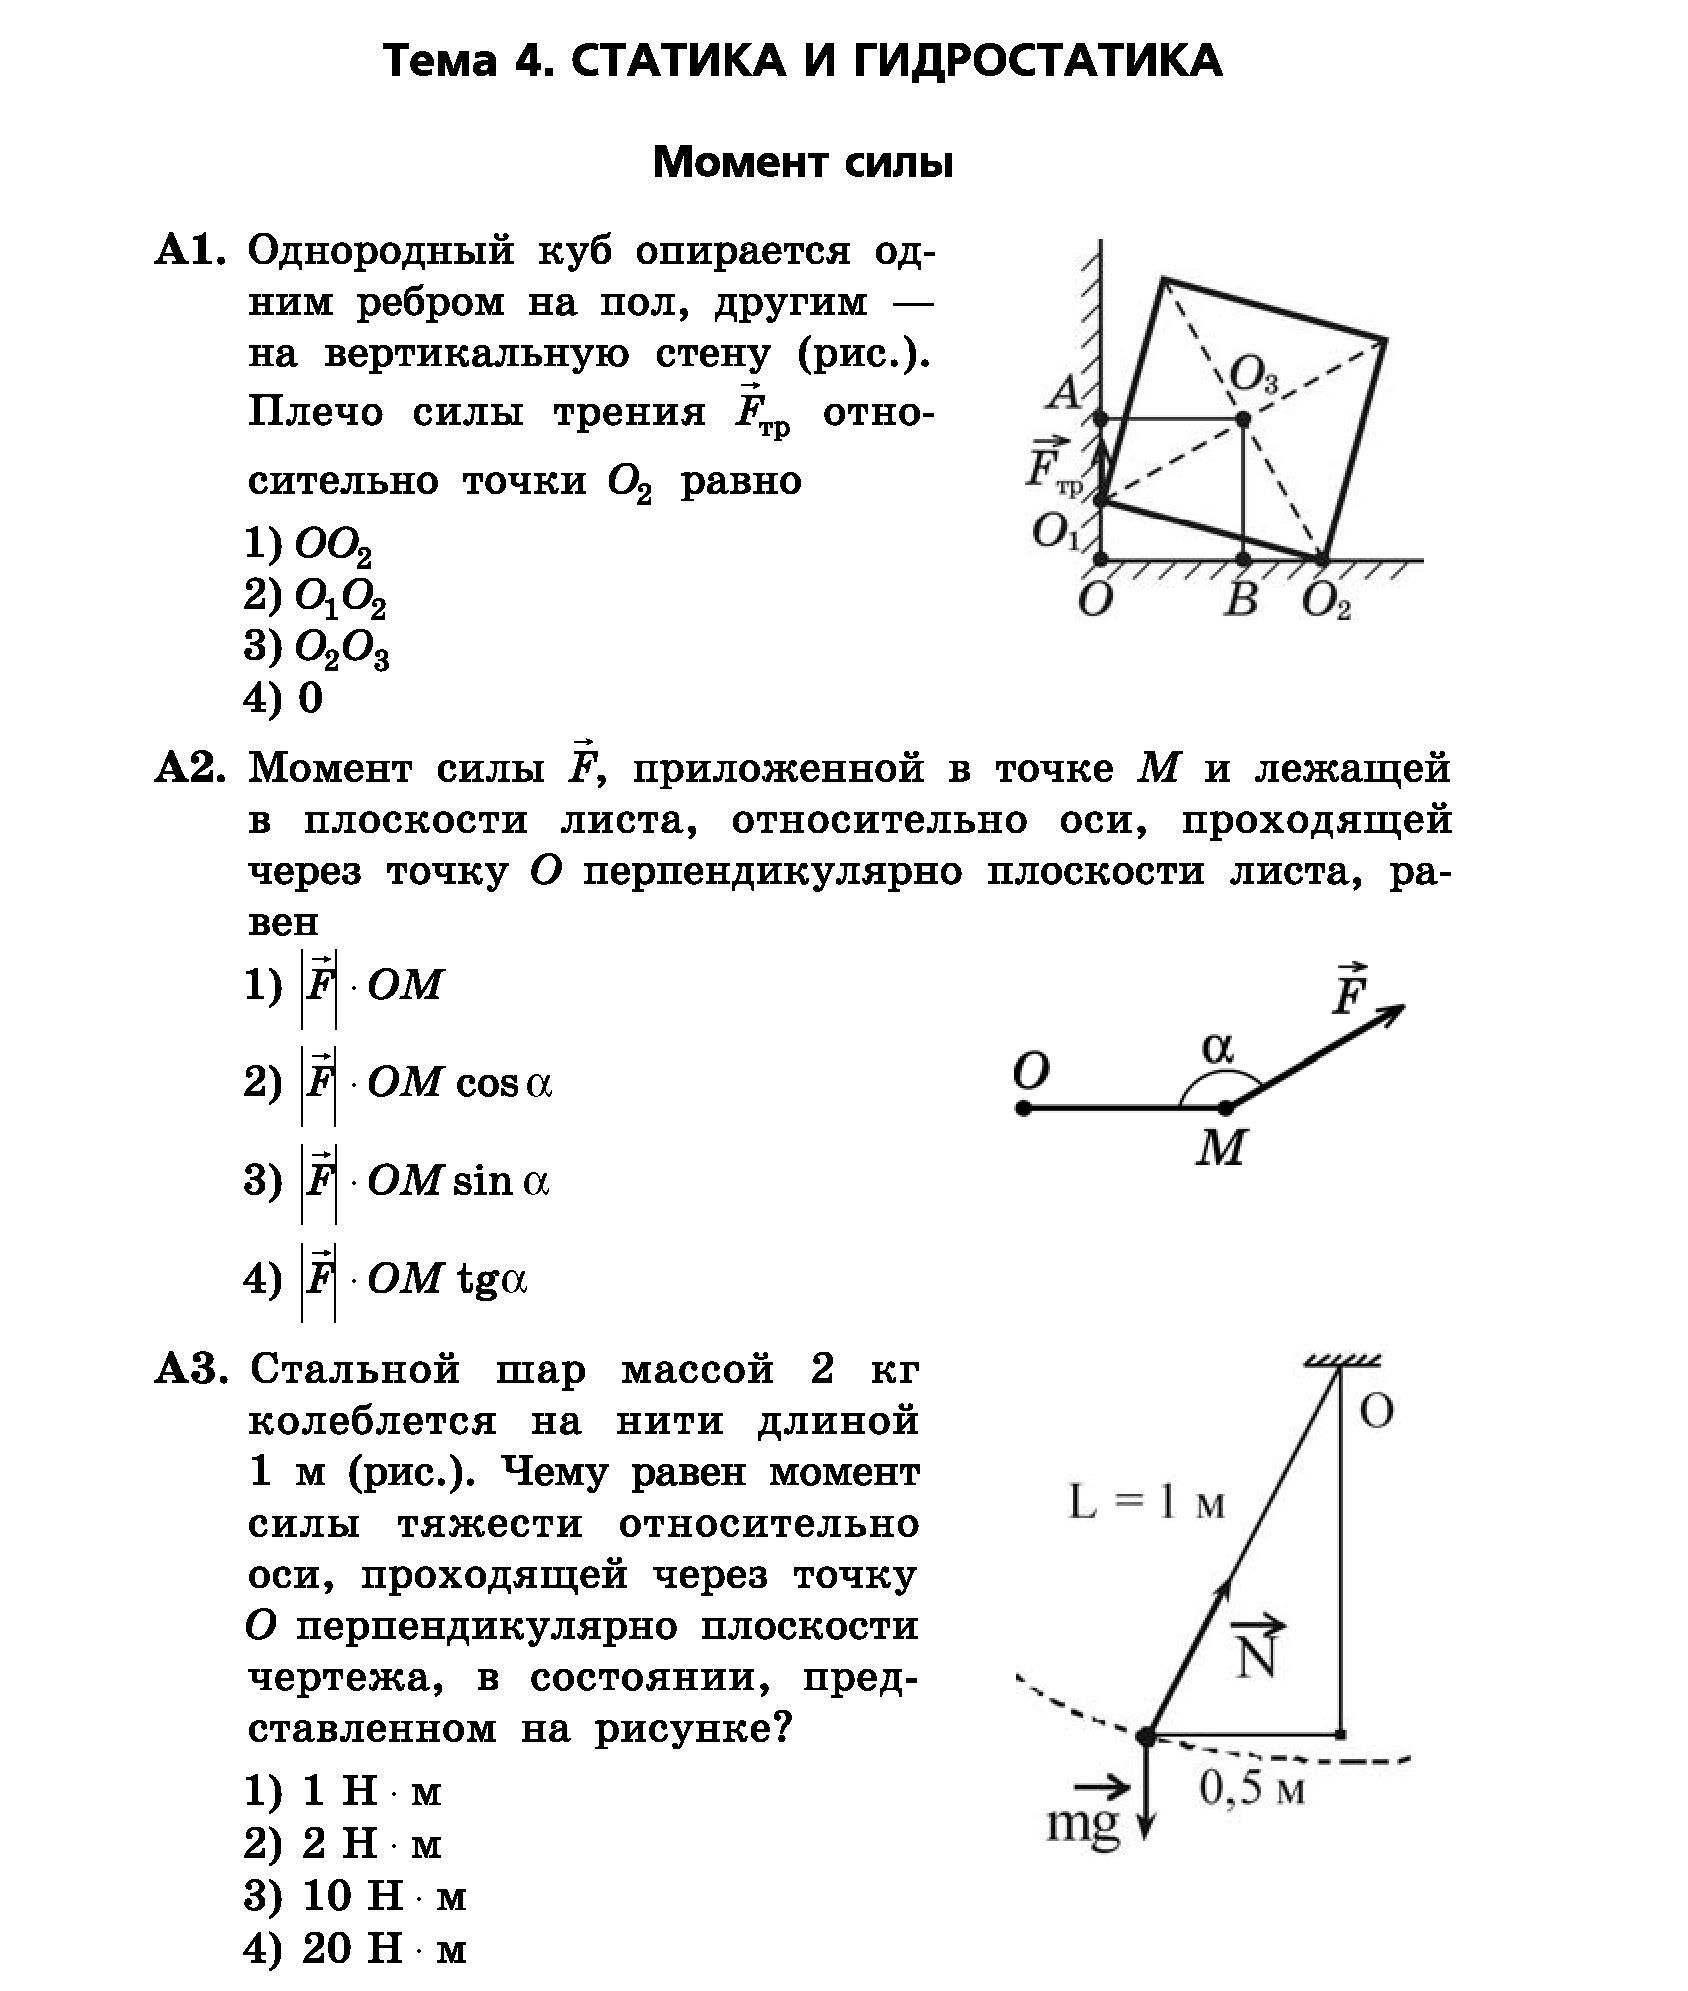 Тесты по физике 10 класс статика